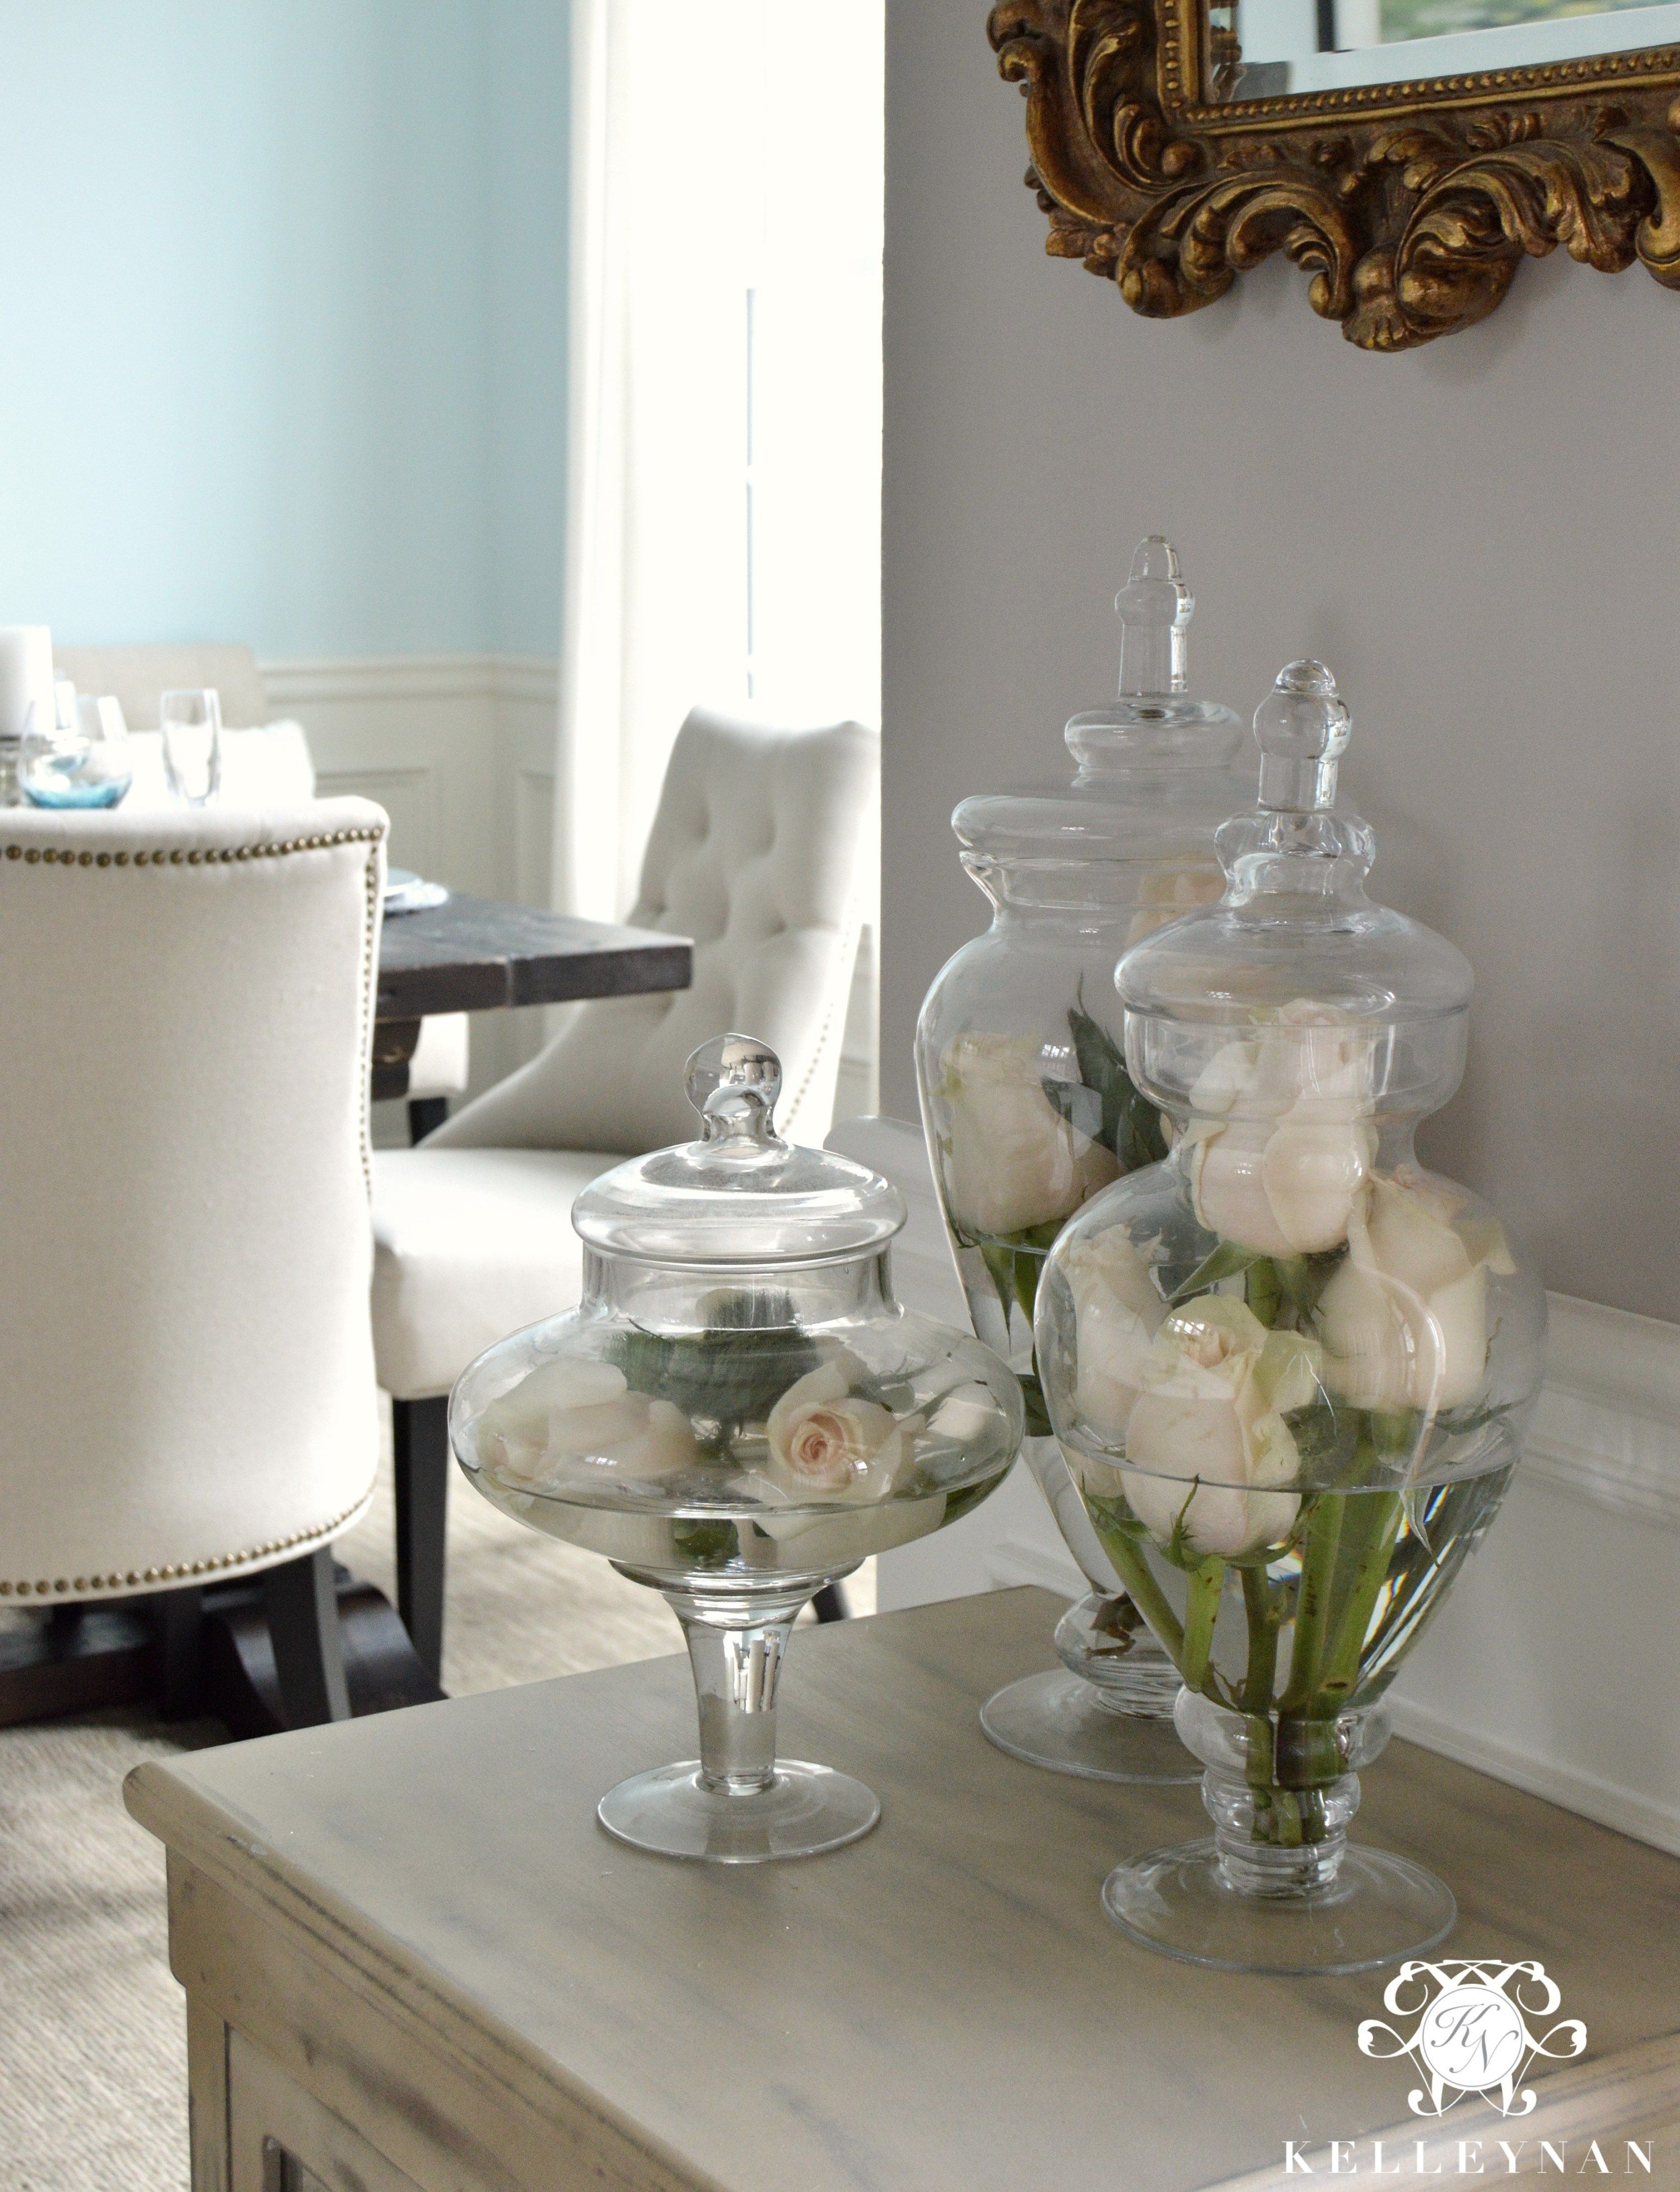 16 Ways To Style Apothecary Jars Apothecary Jars Decor